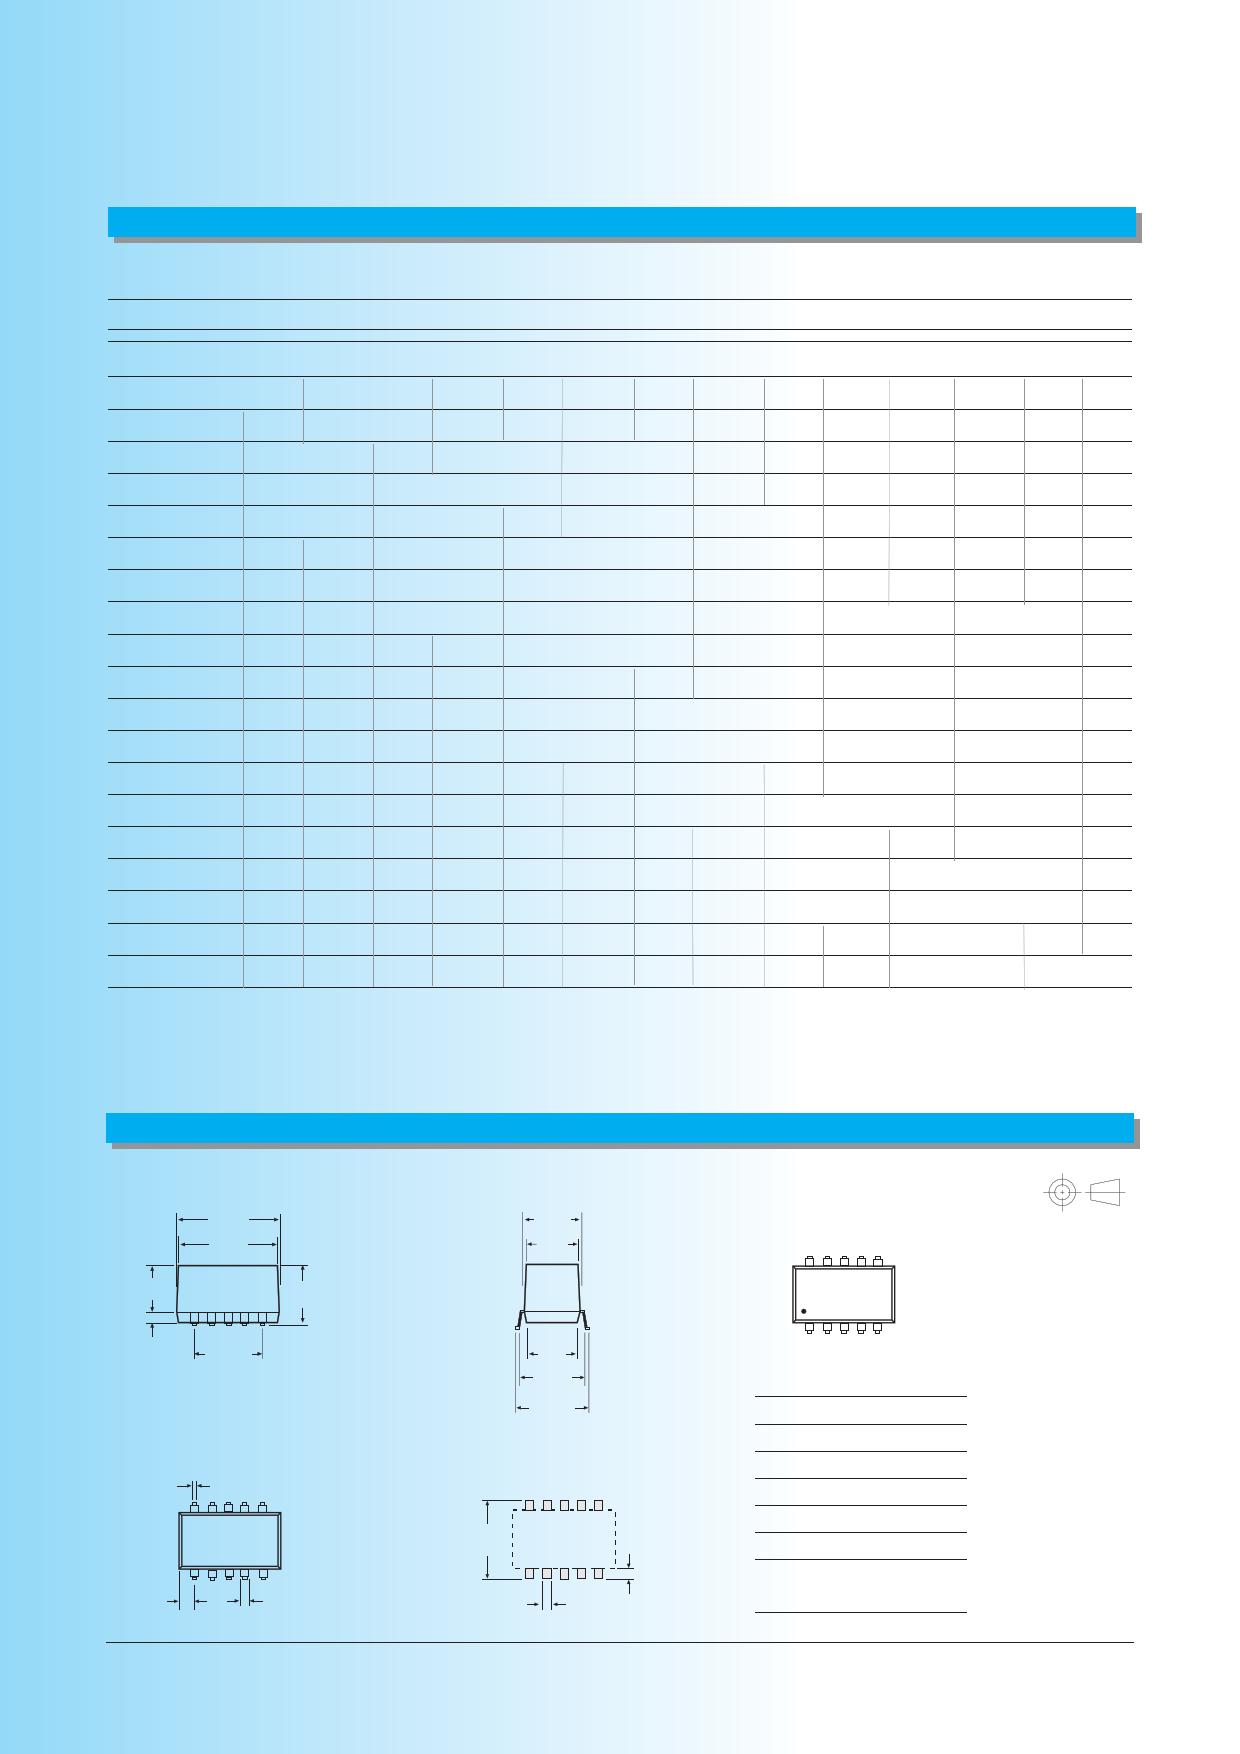 R-78Axx-0.5SMD pdf, arduino